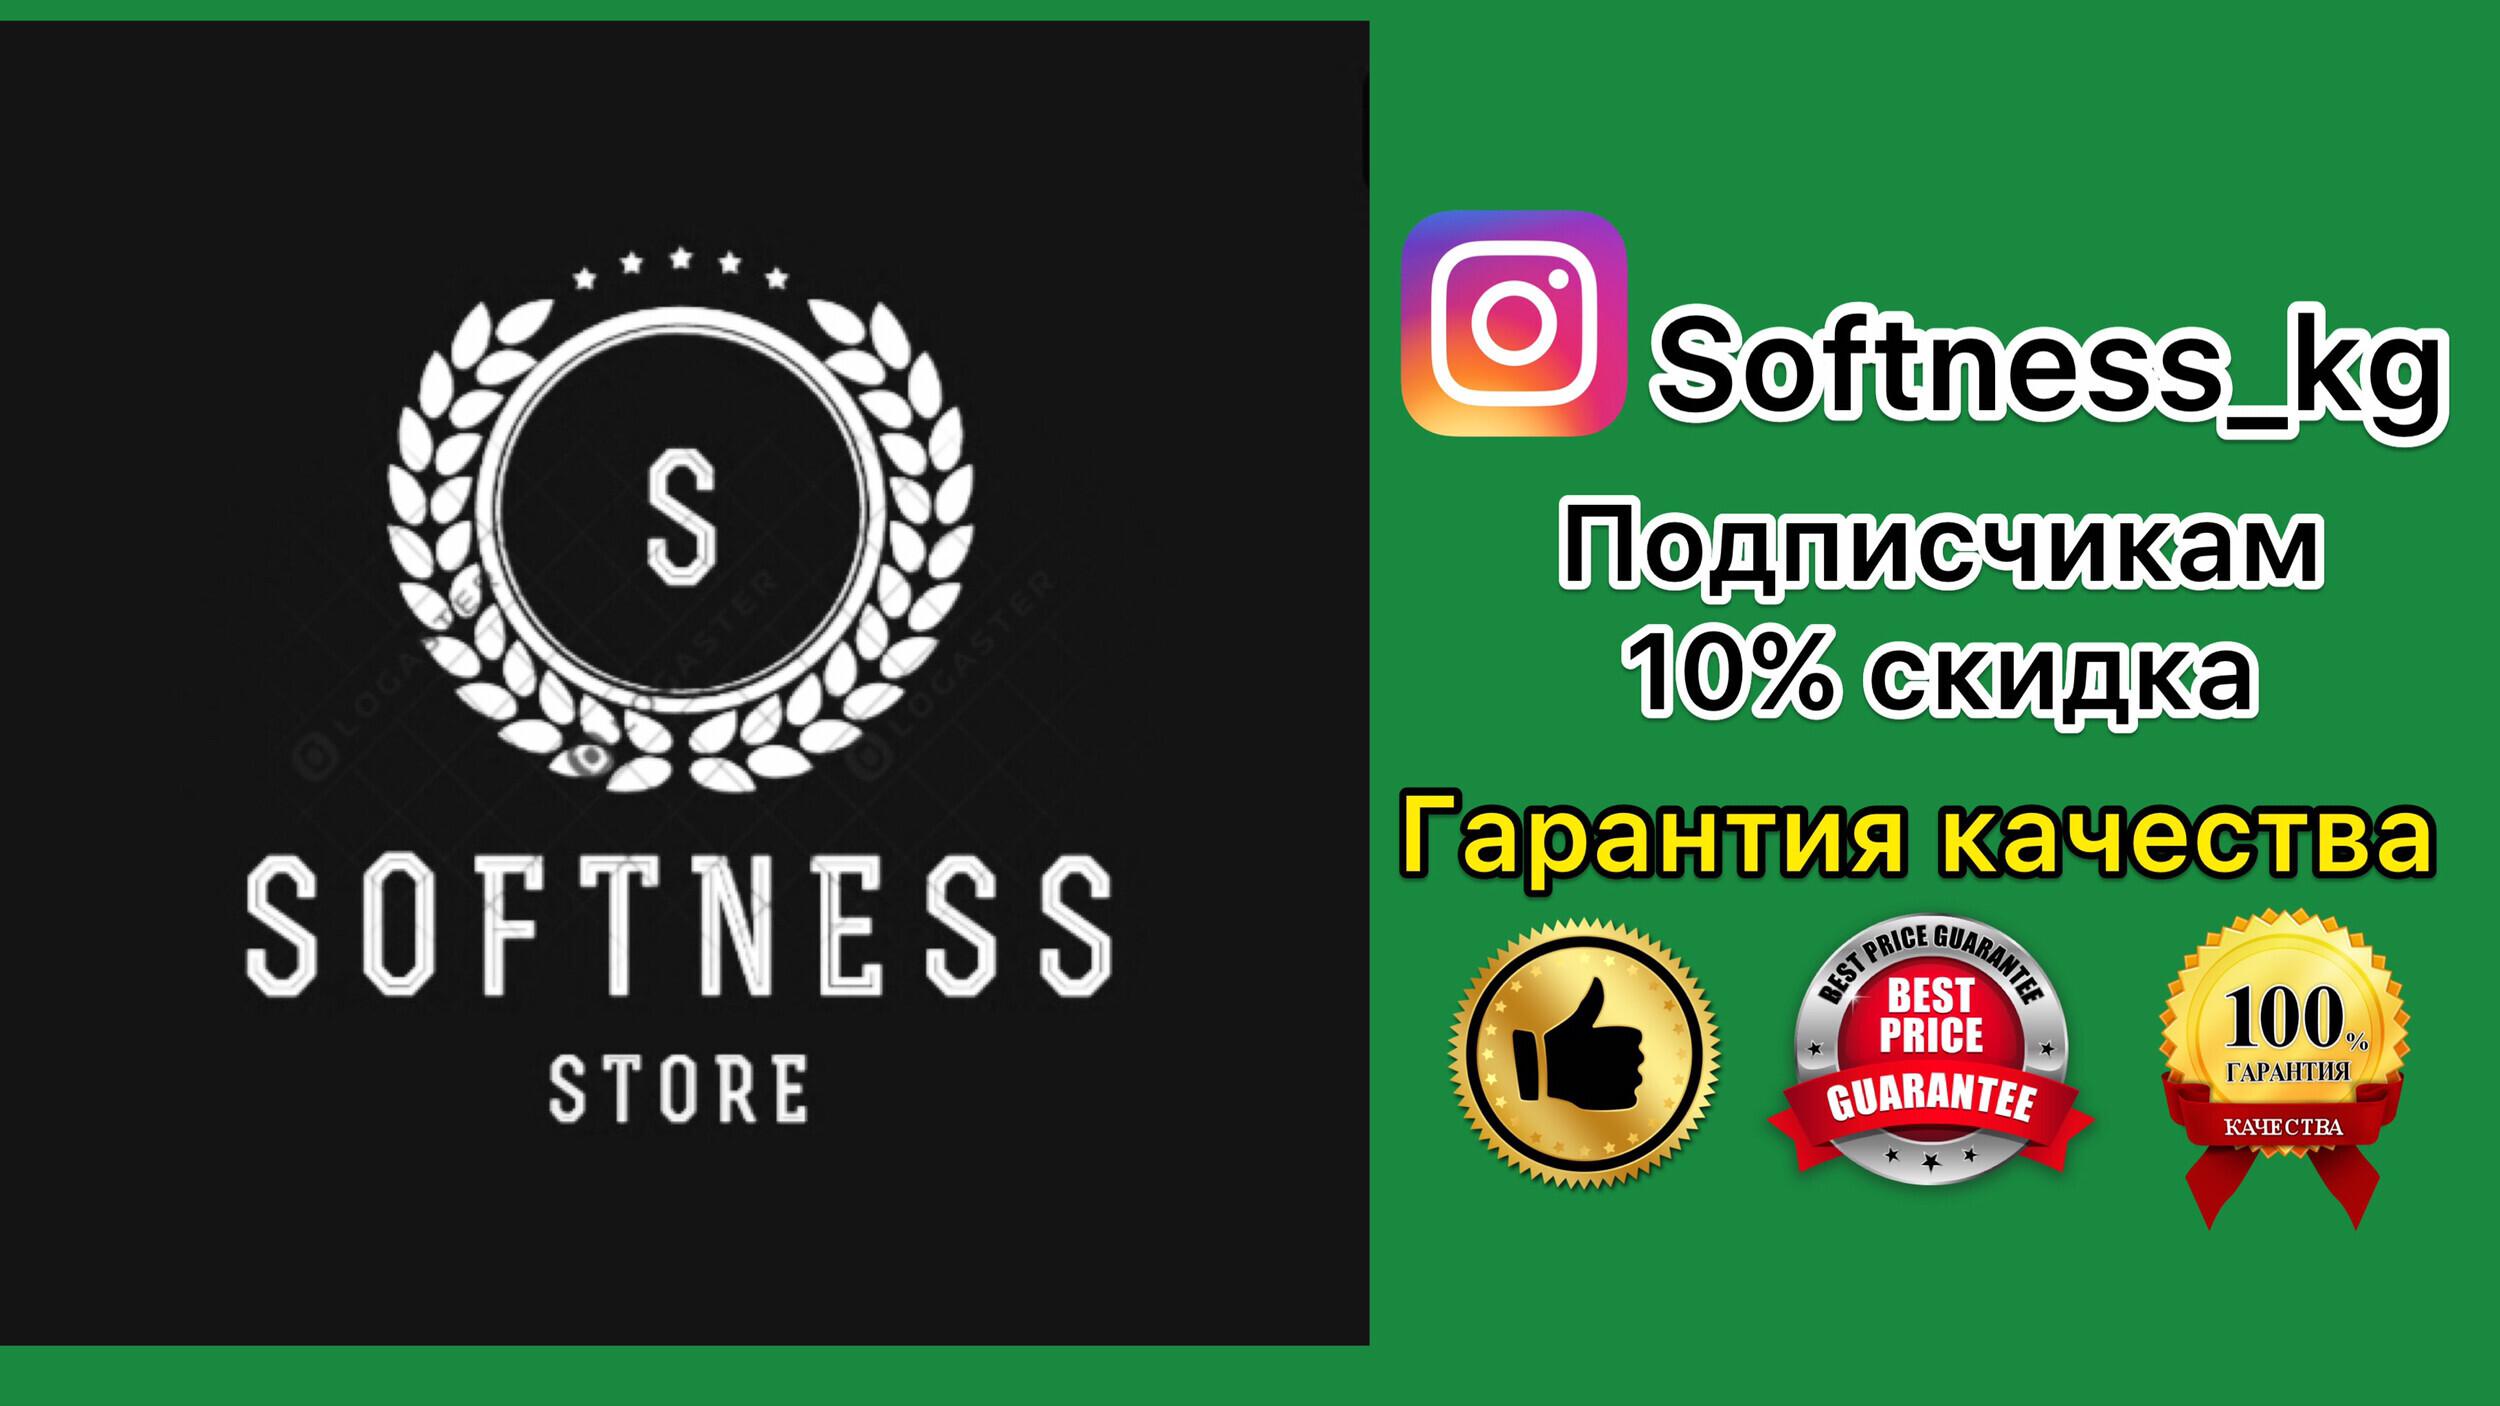 Склад - Softness - Бизнес-профиль компании на lalafo.kg | Кыргызстан